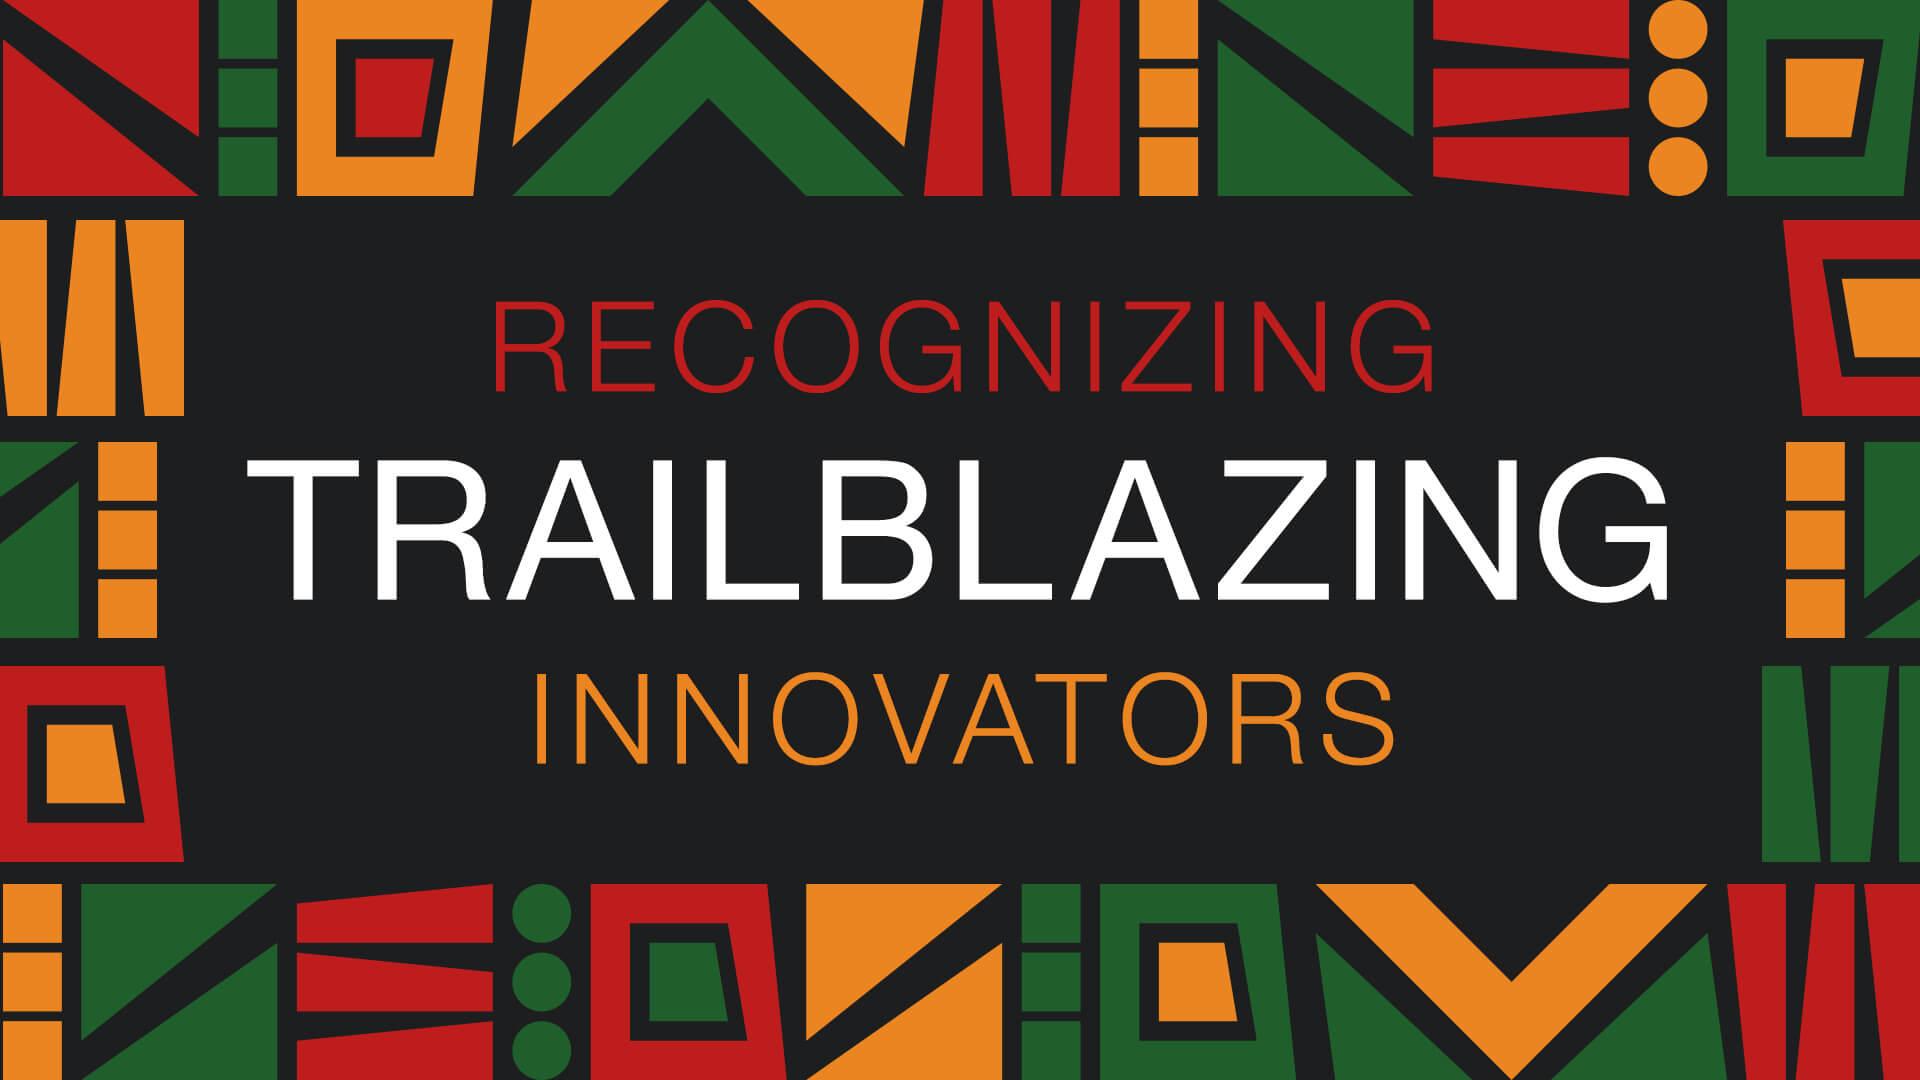 recognizing trailblazing innovators